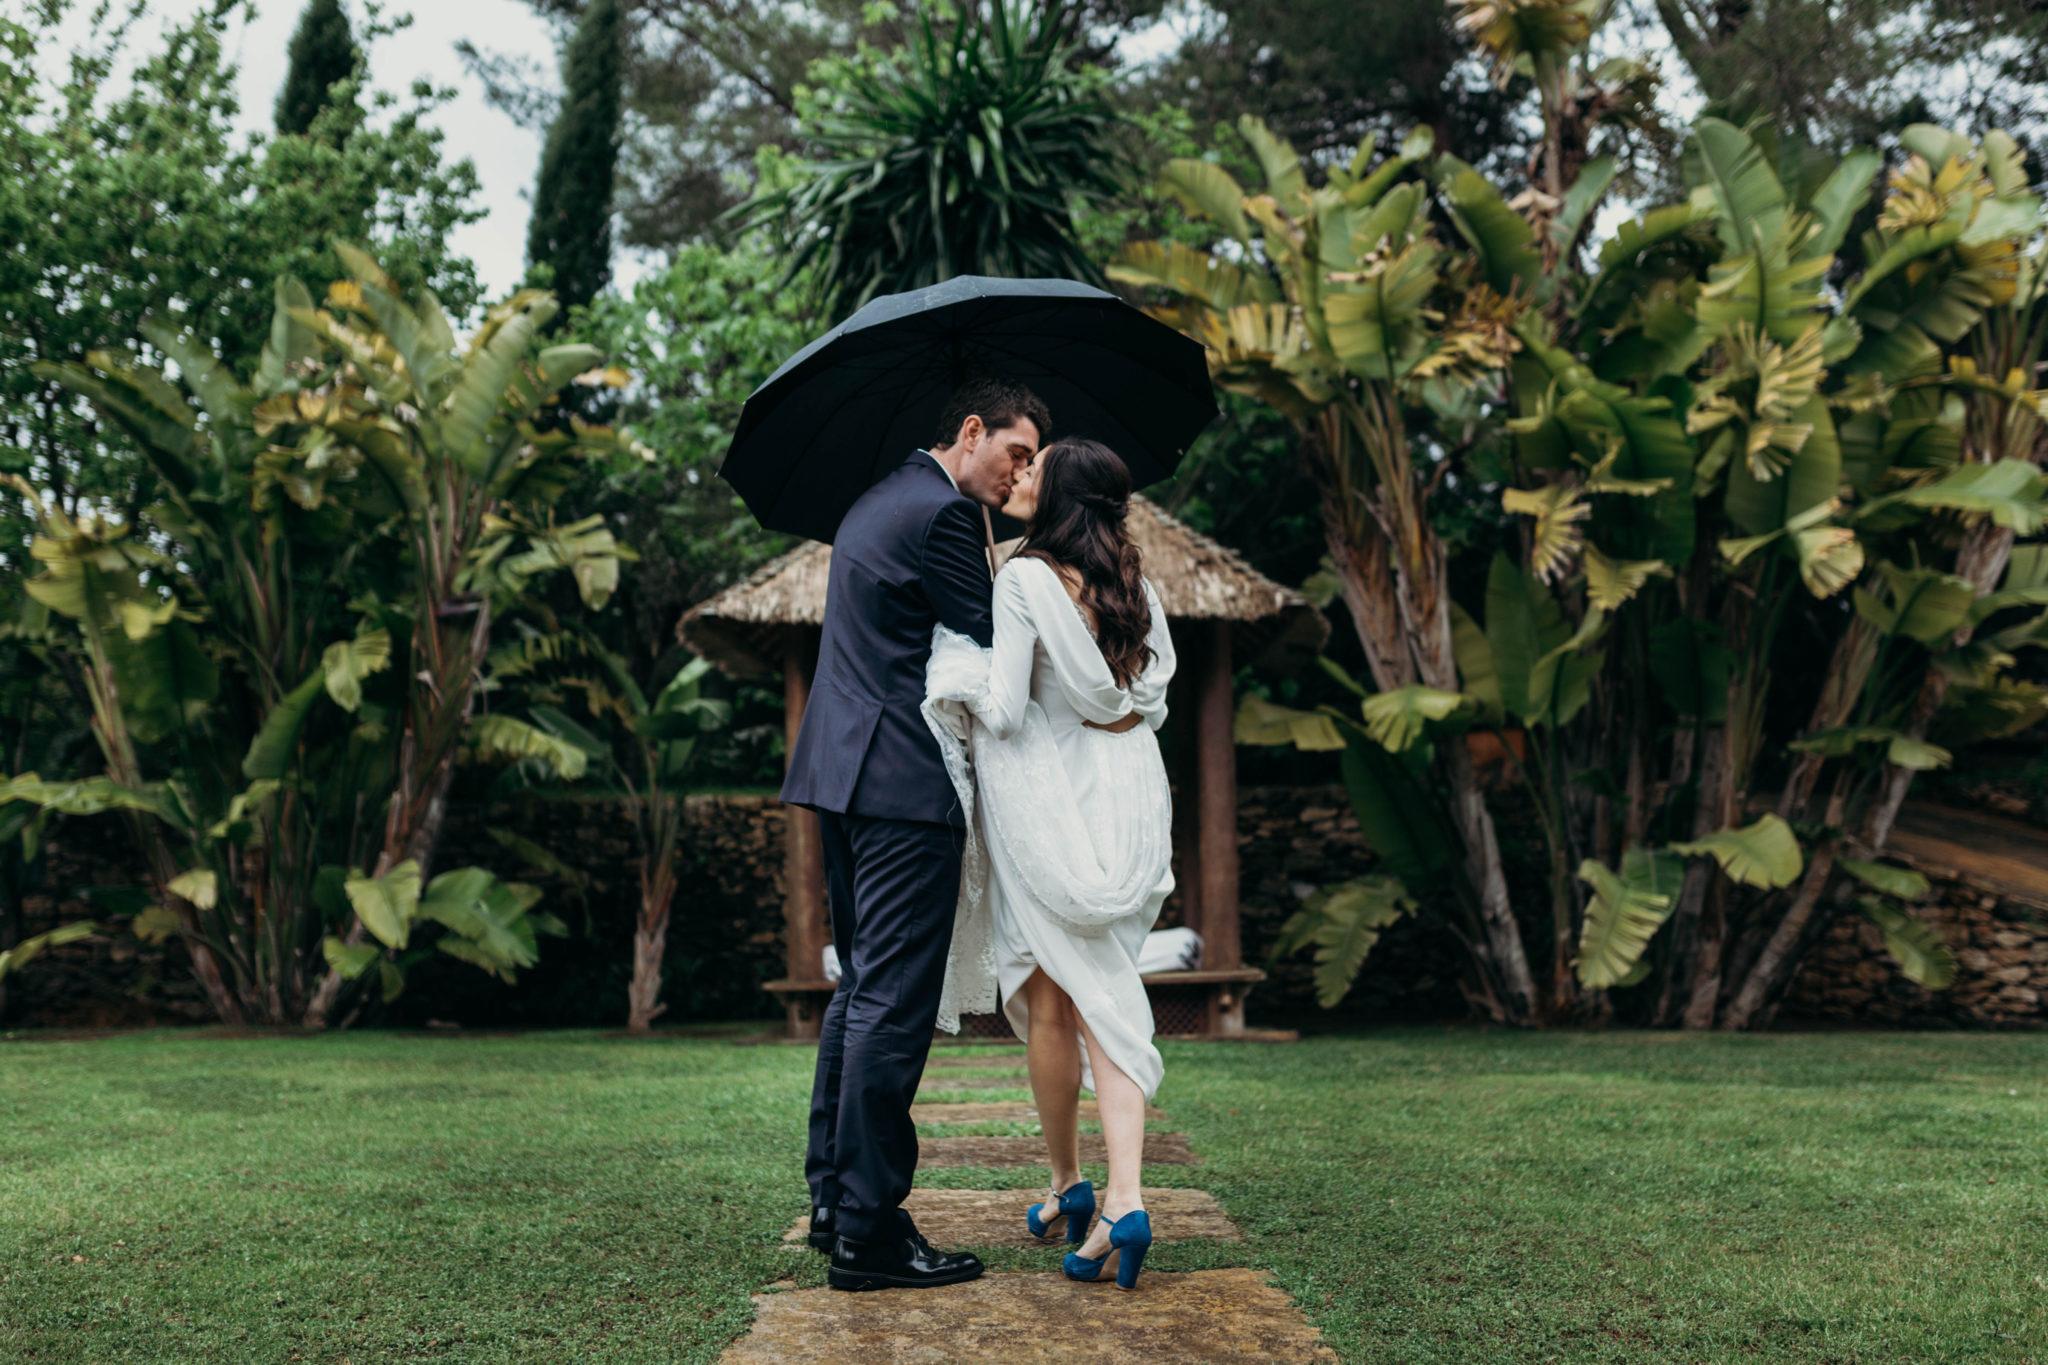 Maria i Xavier, una boda afortunada